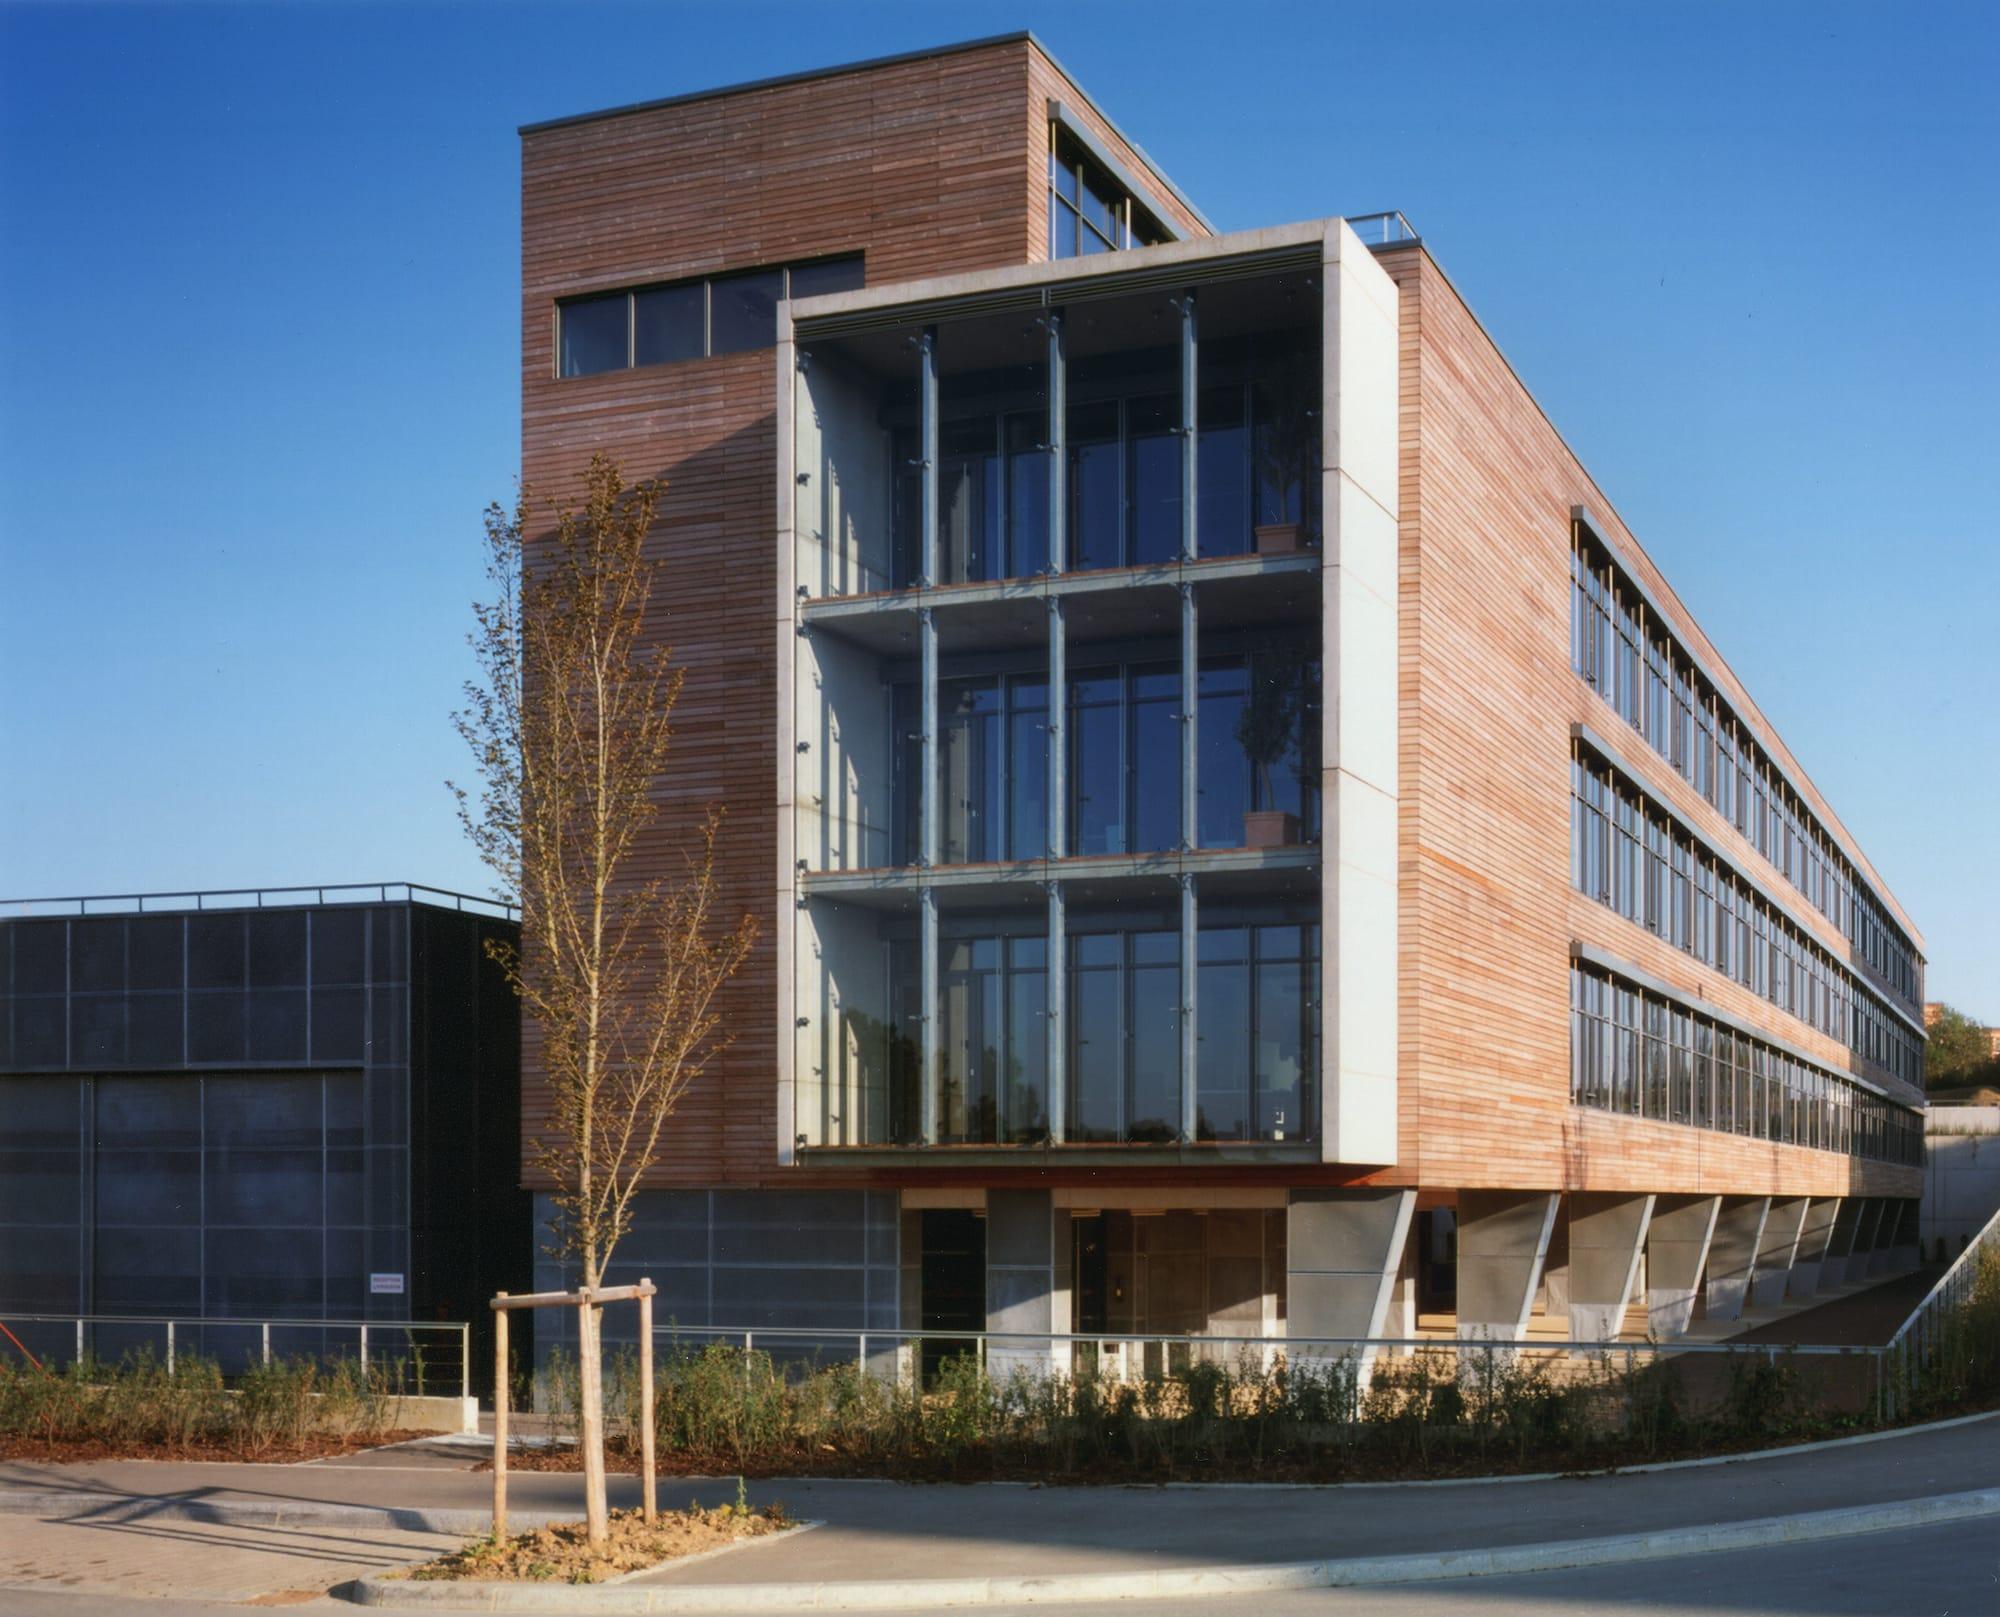 Cba christian bauer & associés architectes s.a. luxembourg